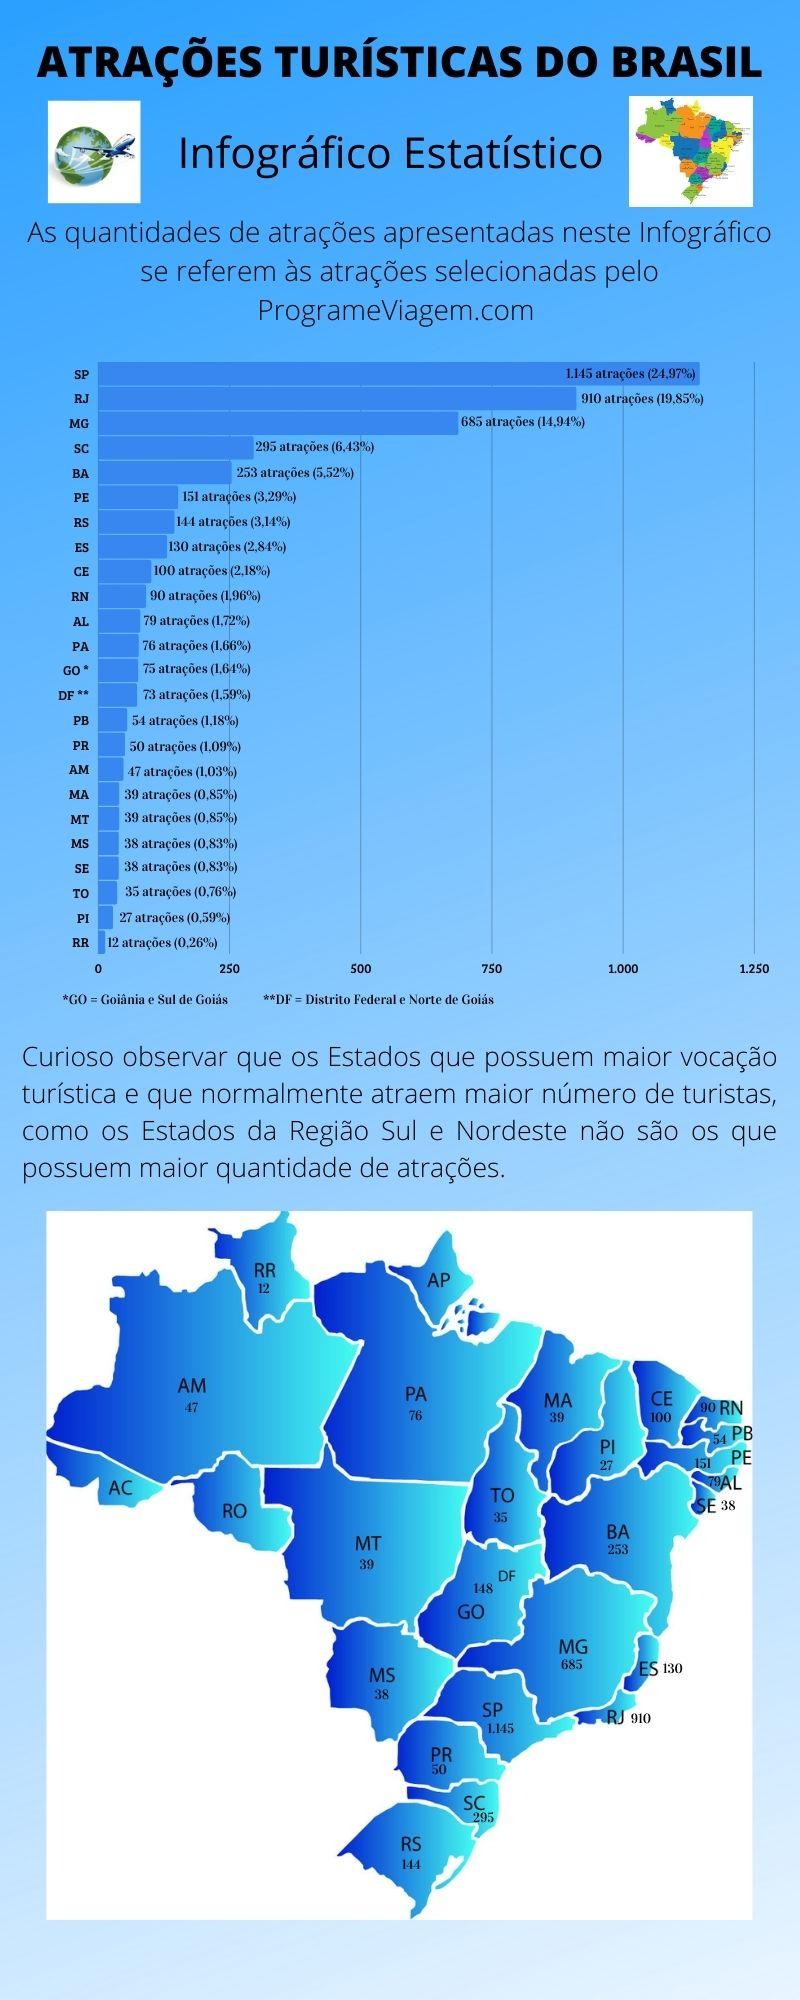 Infográfico Atrações Turísticas do Brasil